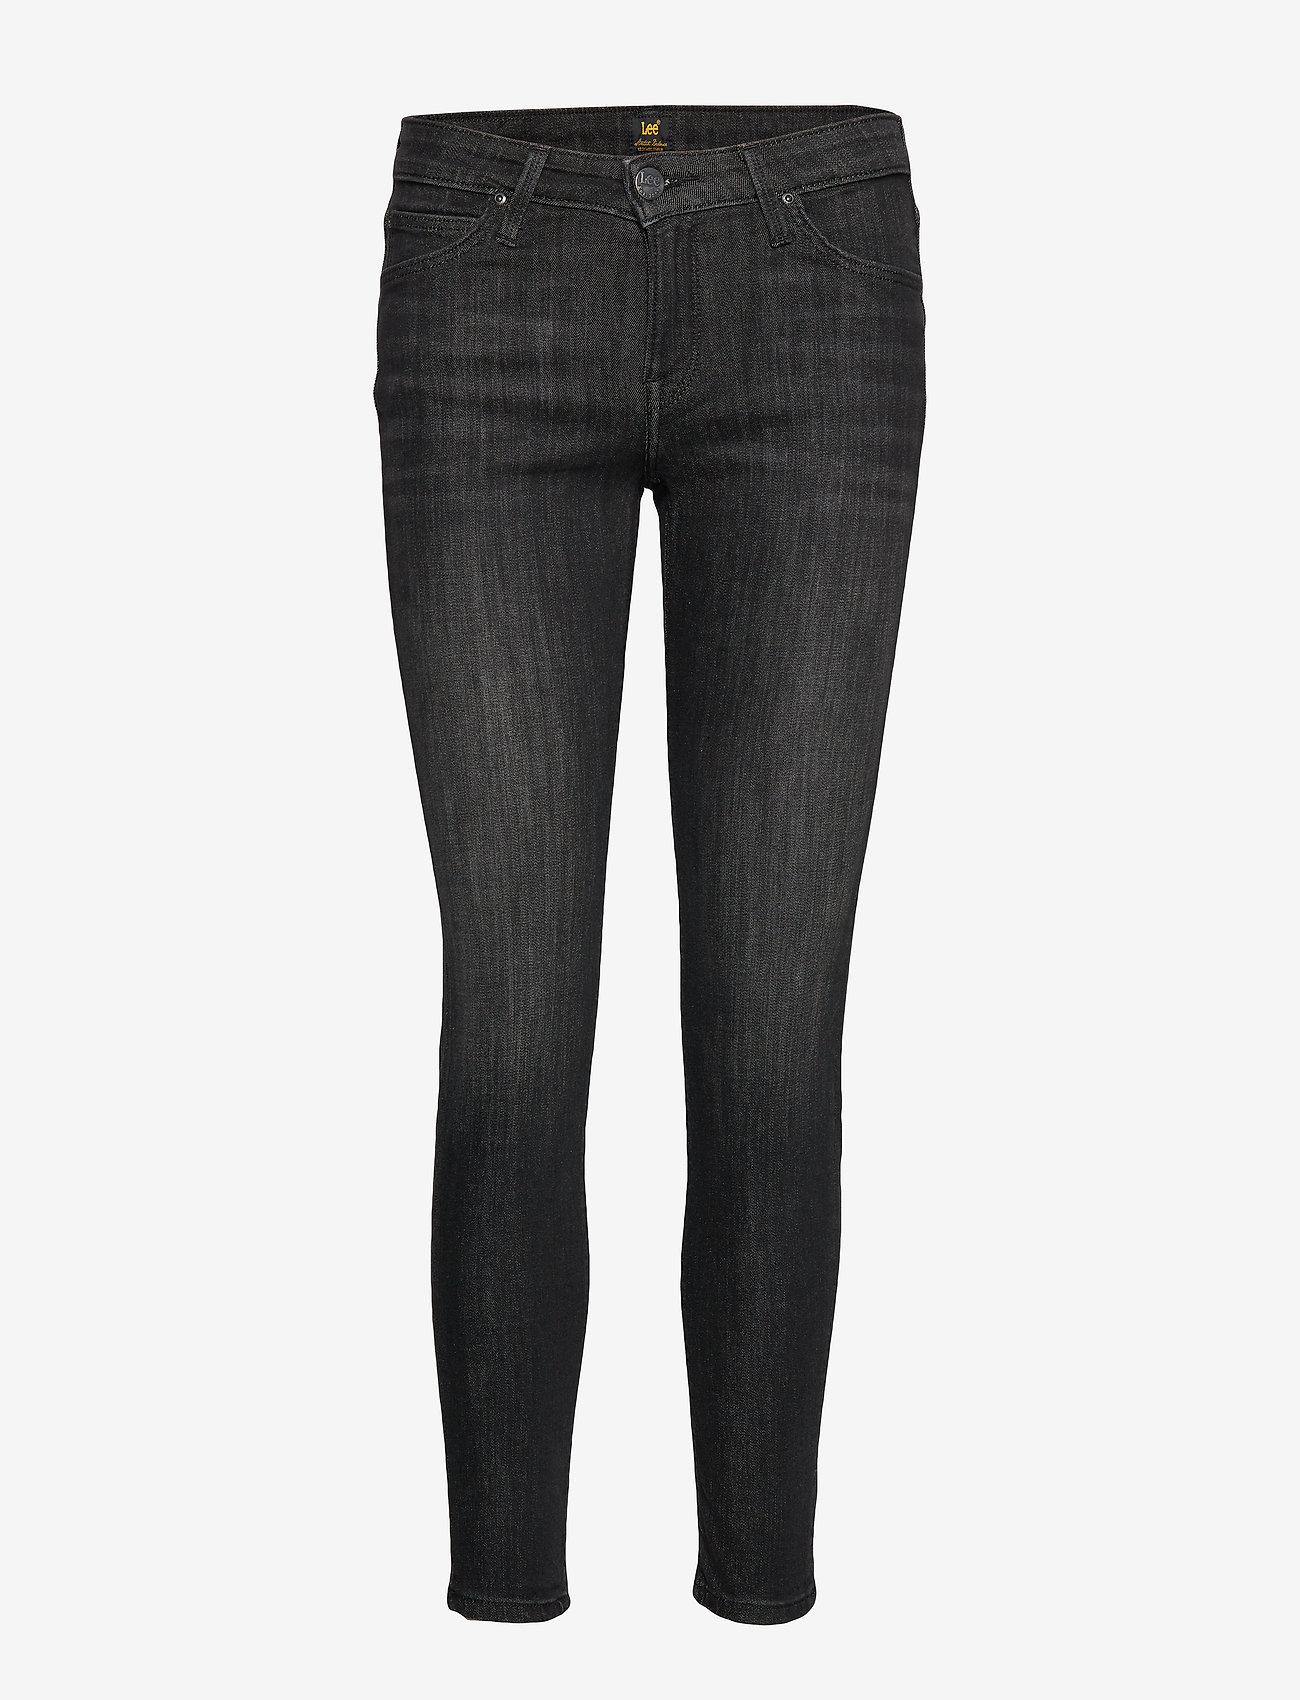 Lee Jeans - SCARLETT - skinny jeans - black orrick - 0